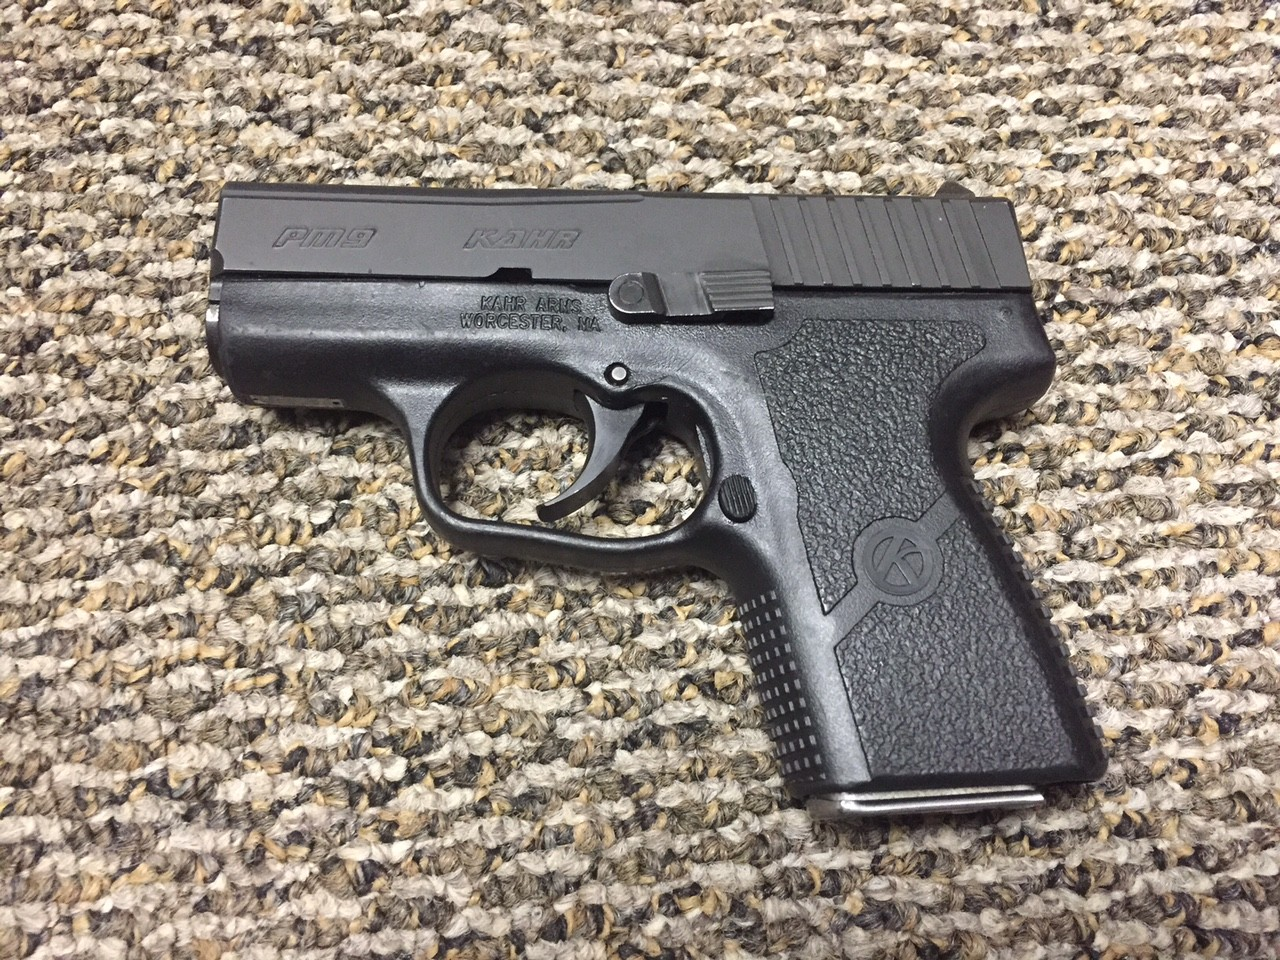 Misc Guns For Sale S Amp W 44 M4 12ga Pm9 Sig 22 Encore